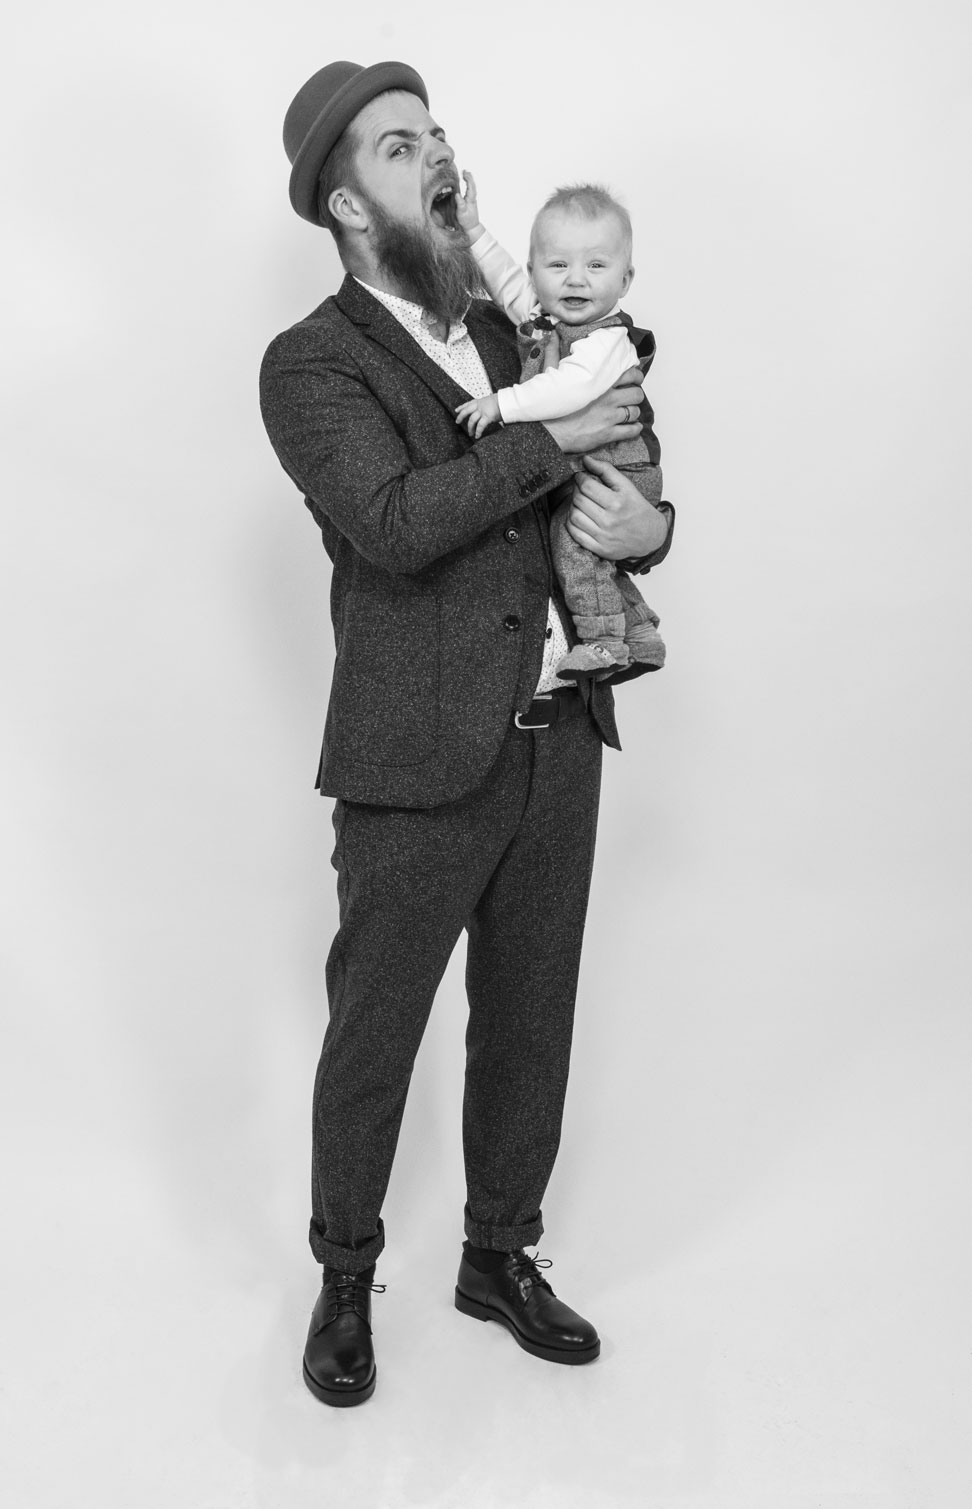 Fabian & Hannes - Vater und Sohn